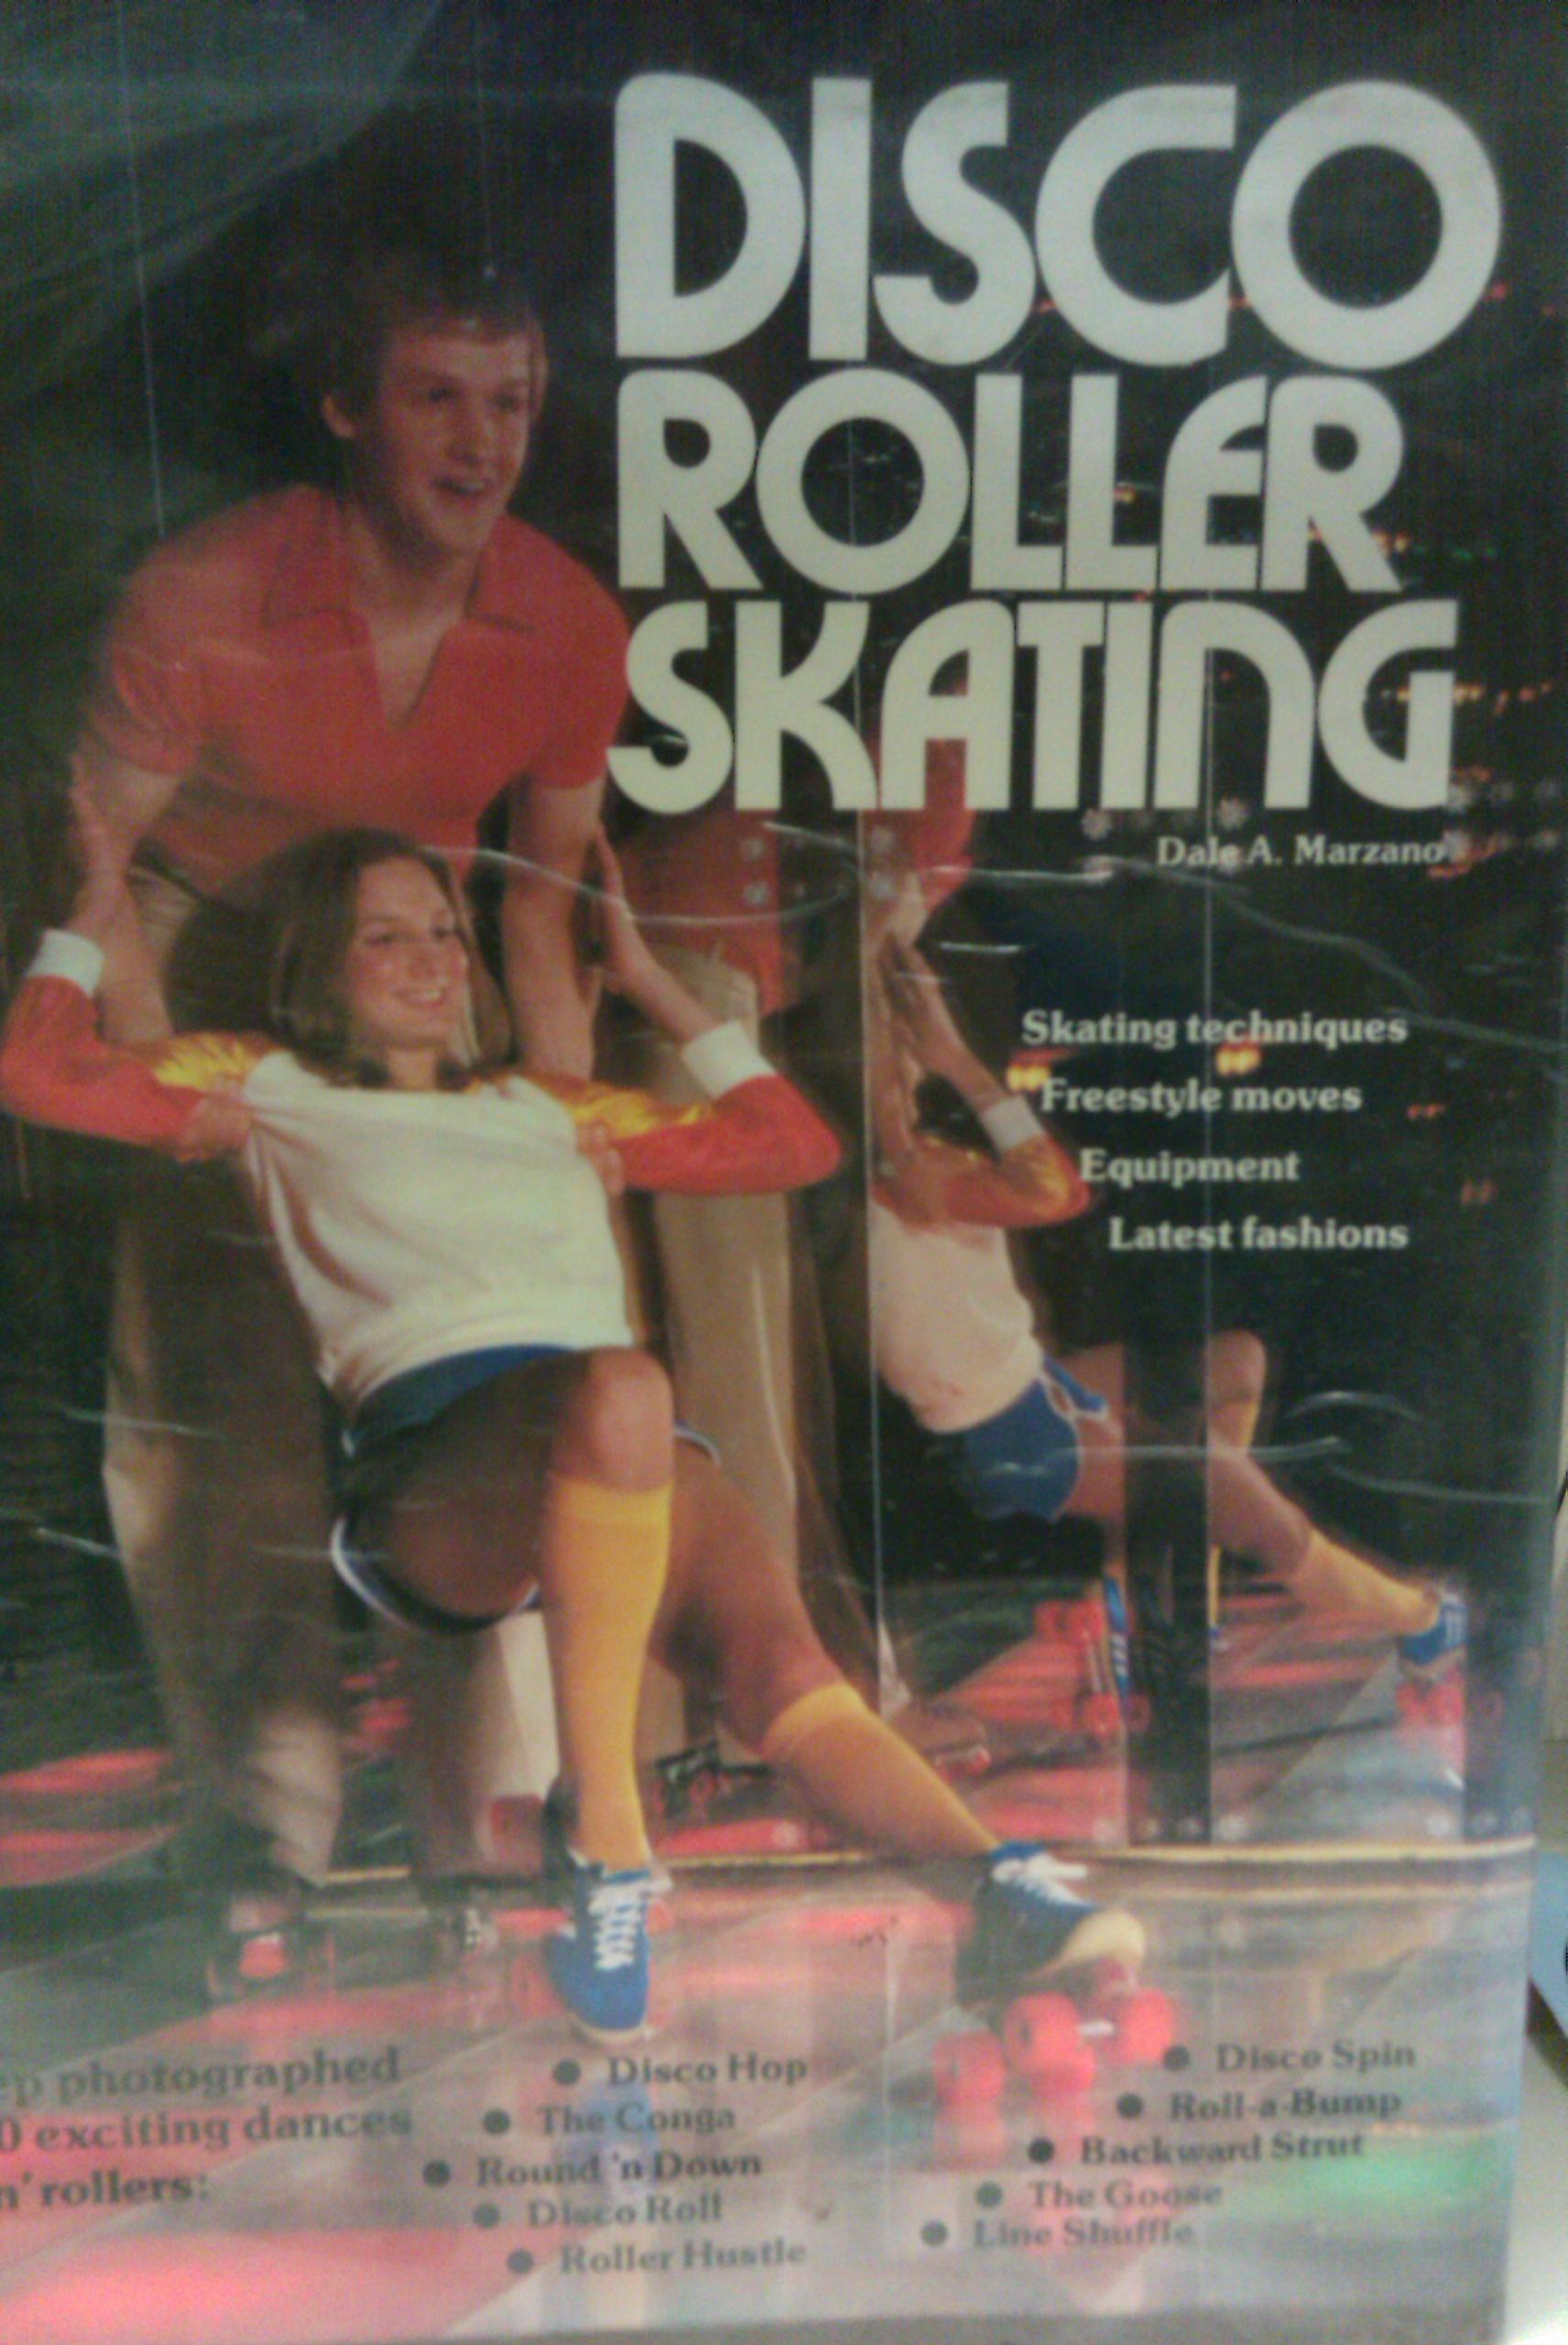 Roller skates in the 70s - Disco Roller Skating